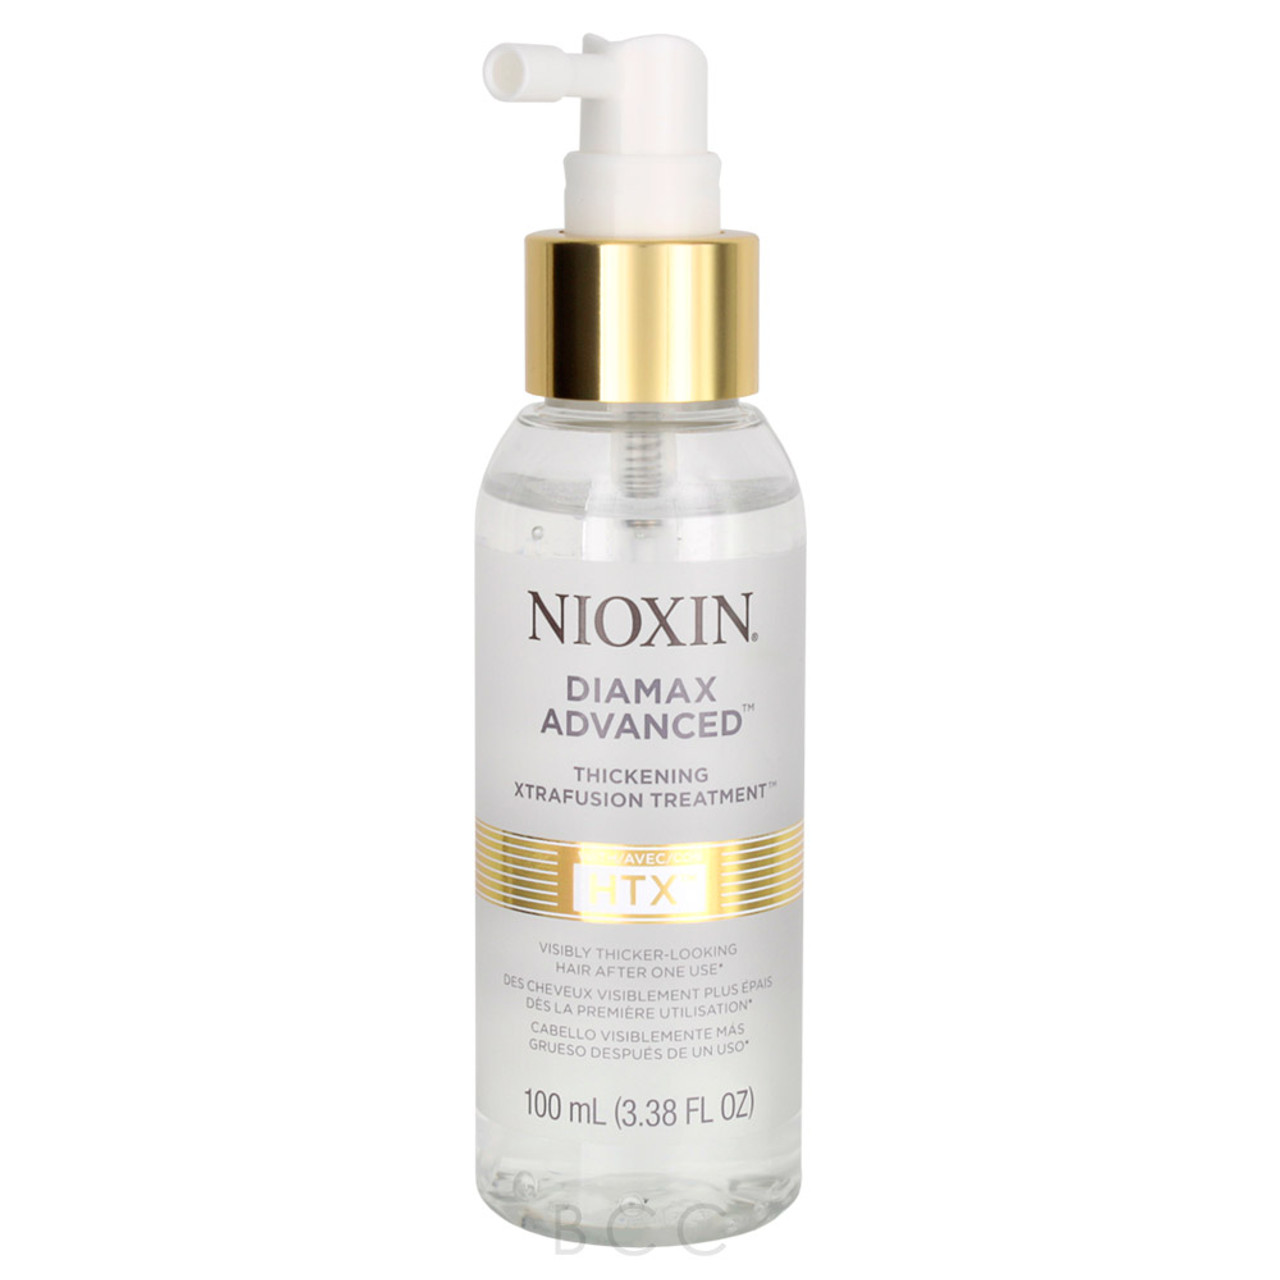 Nioxin Diamax Advanced Treatment 3.4 oz